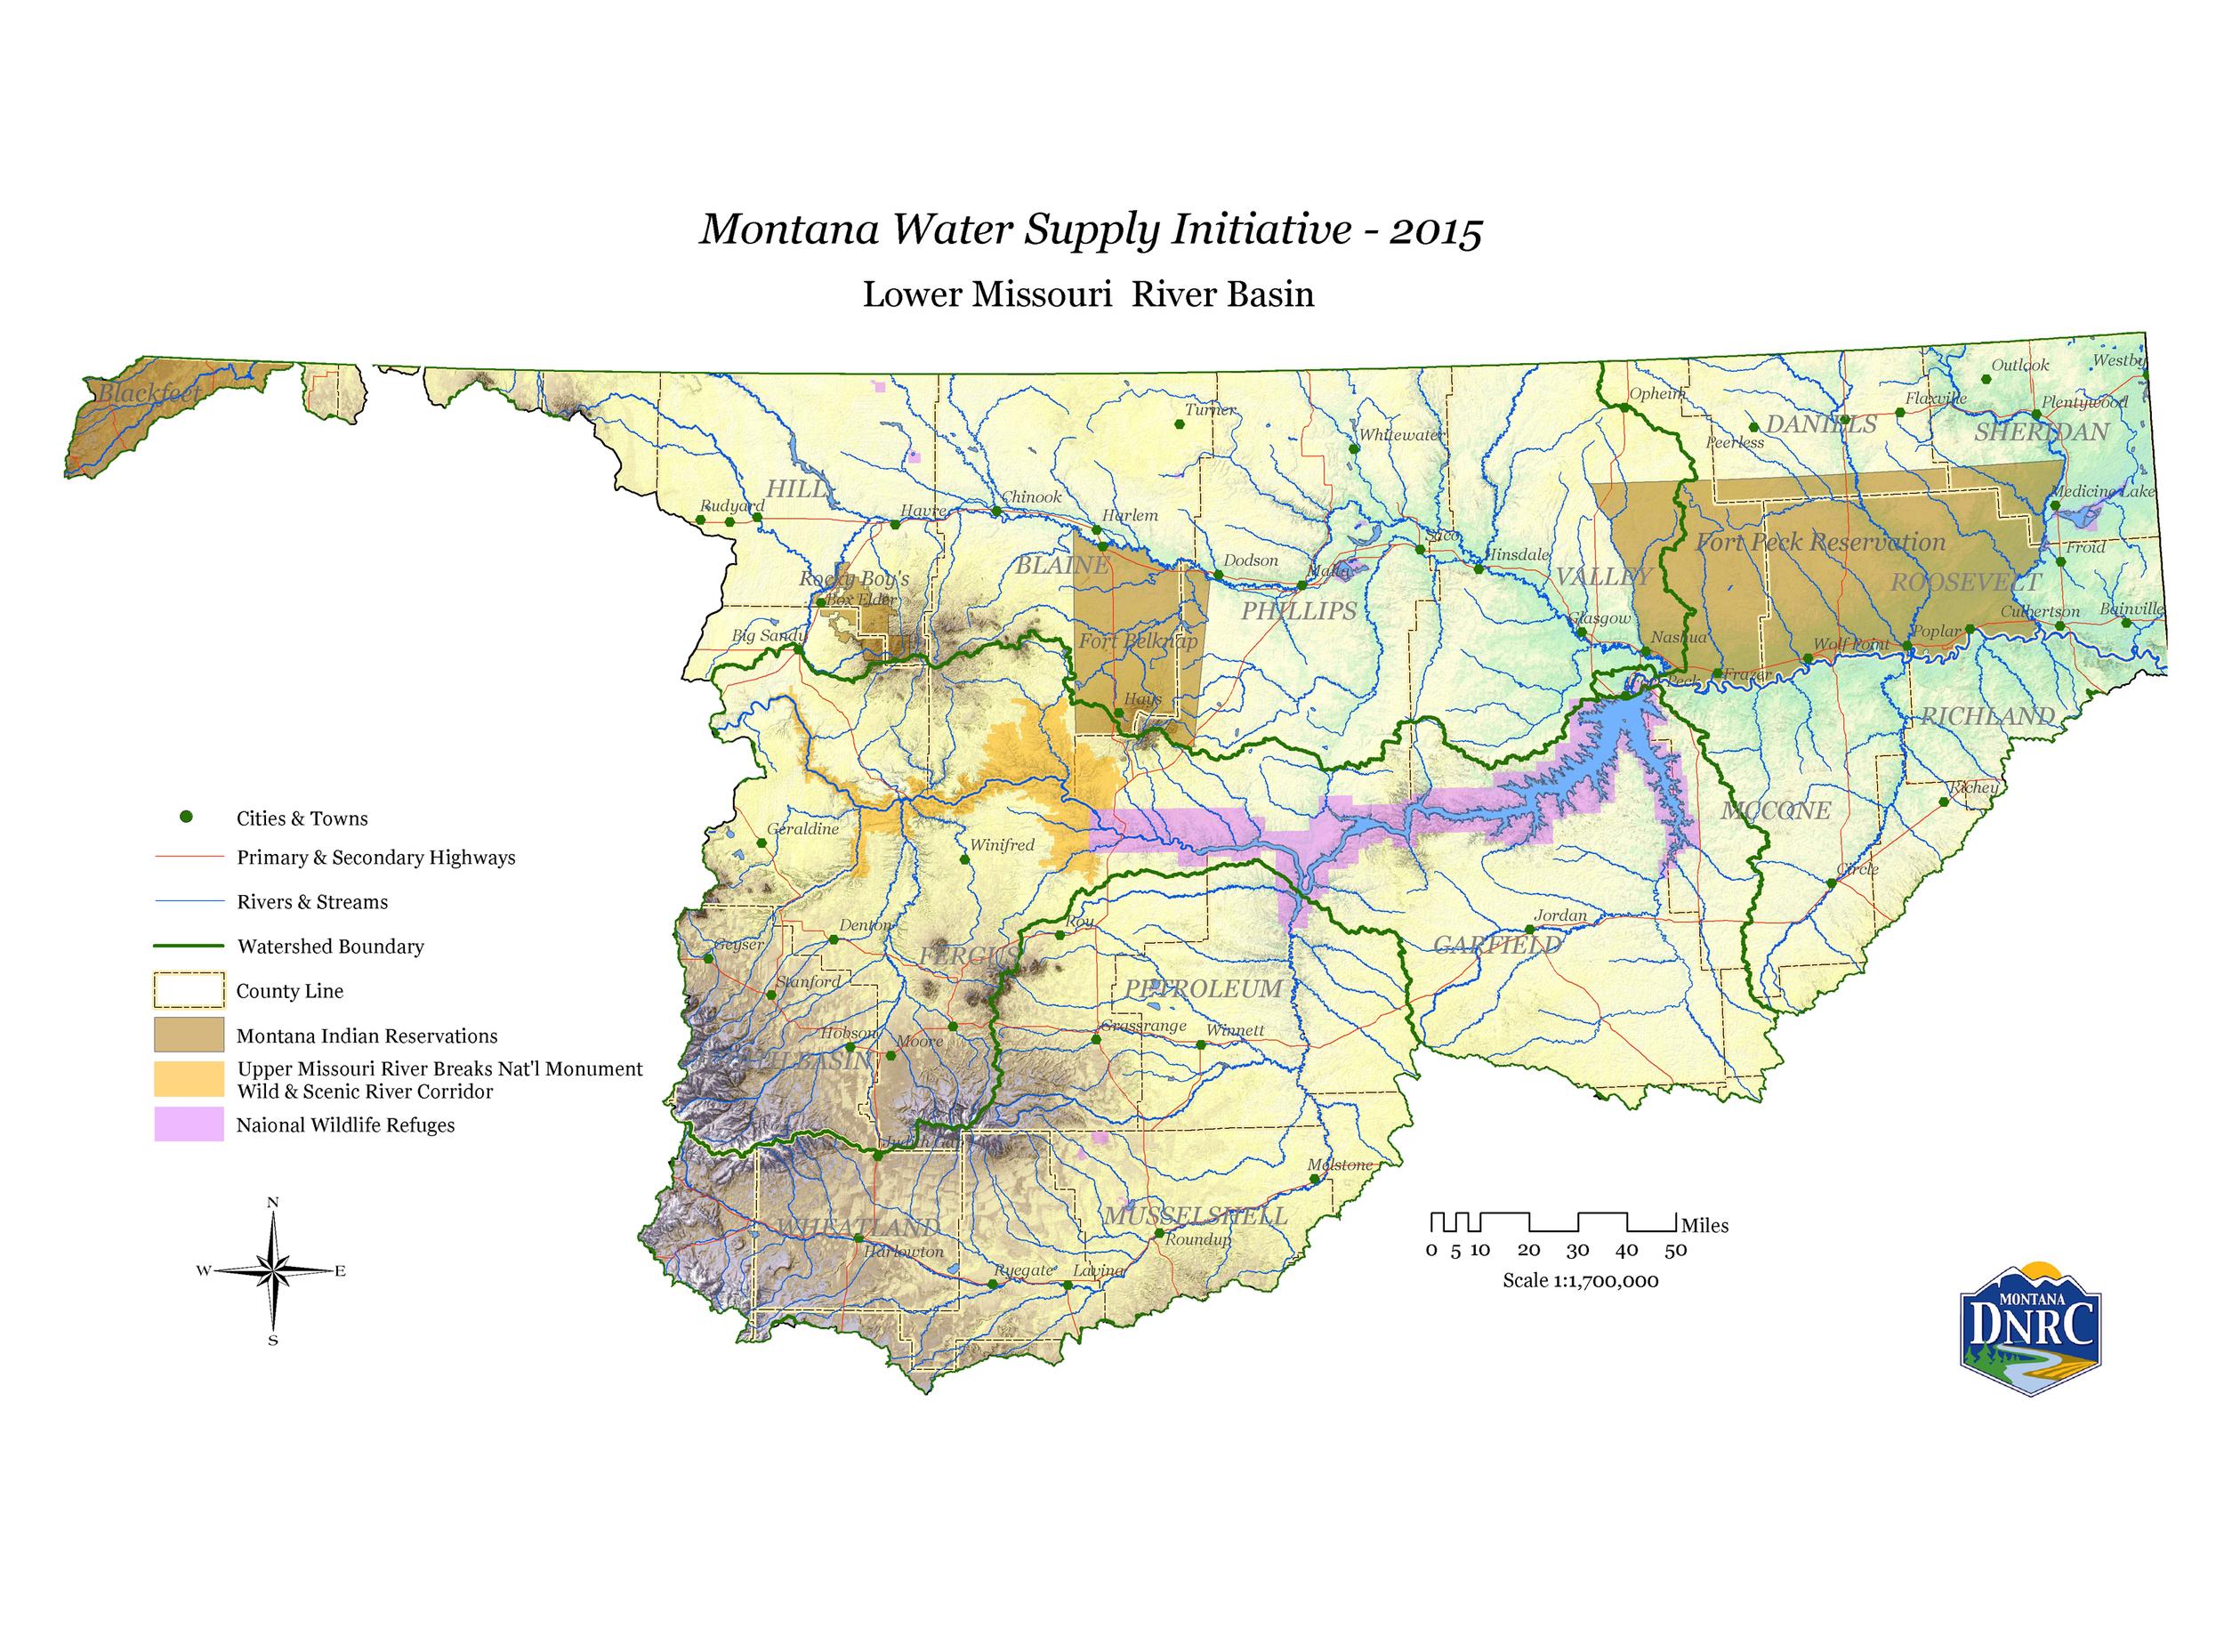 lowermismap.jpg